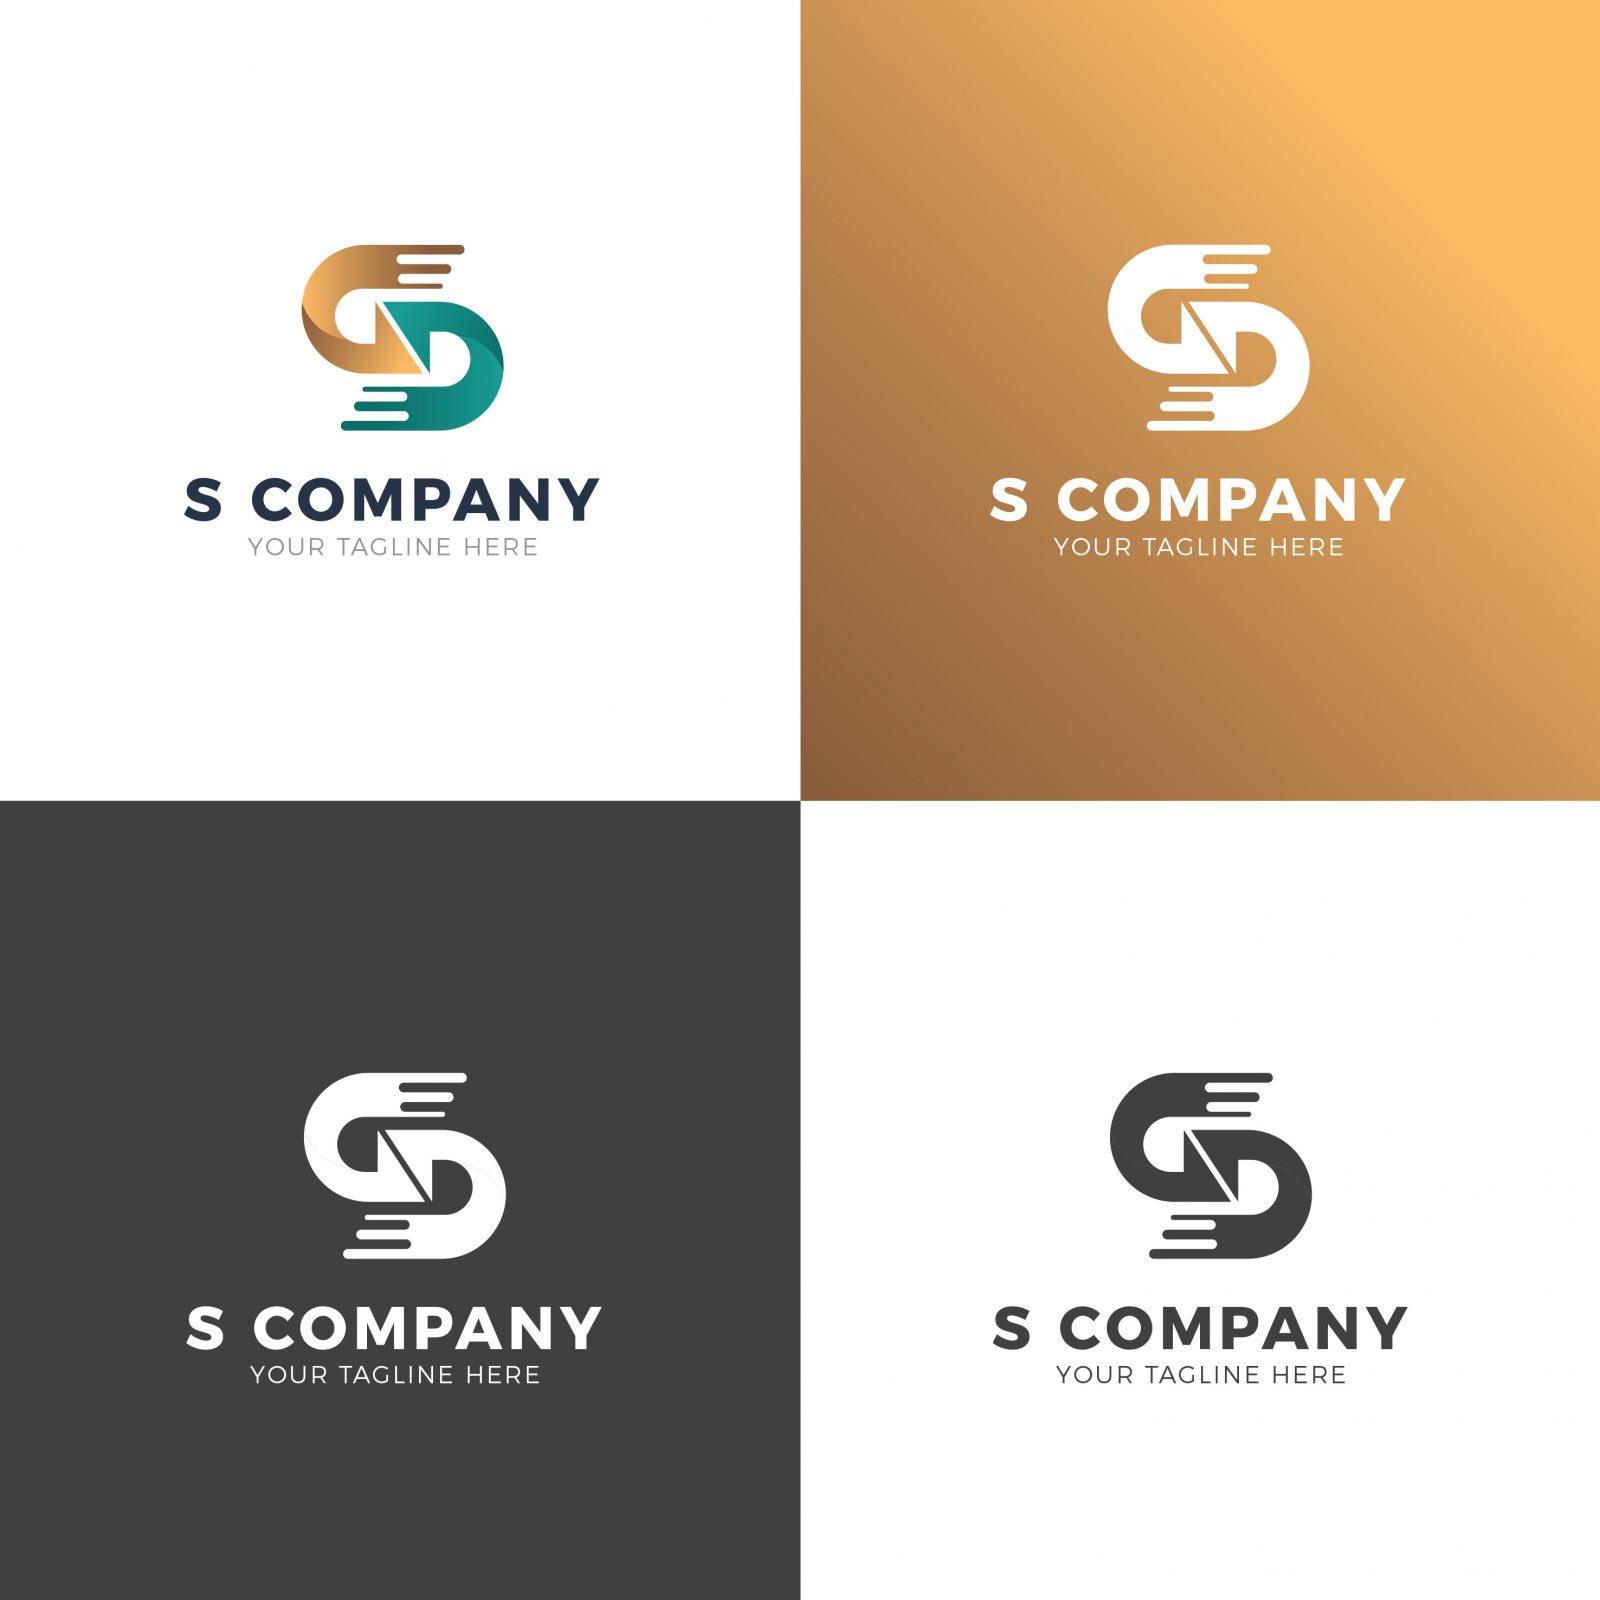 sd professional logo design template 001931